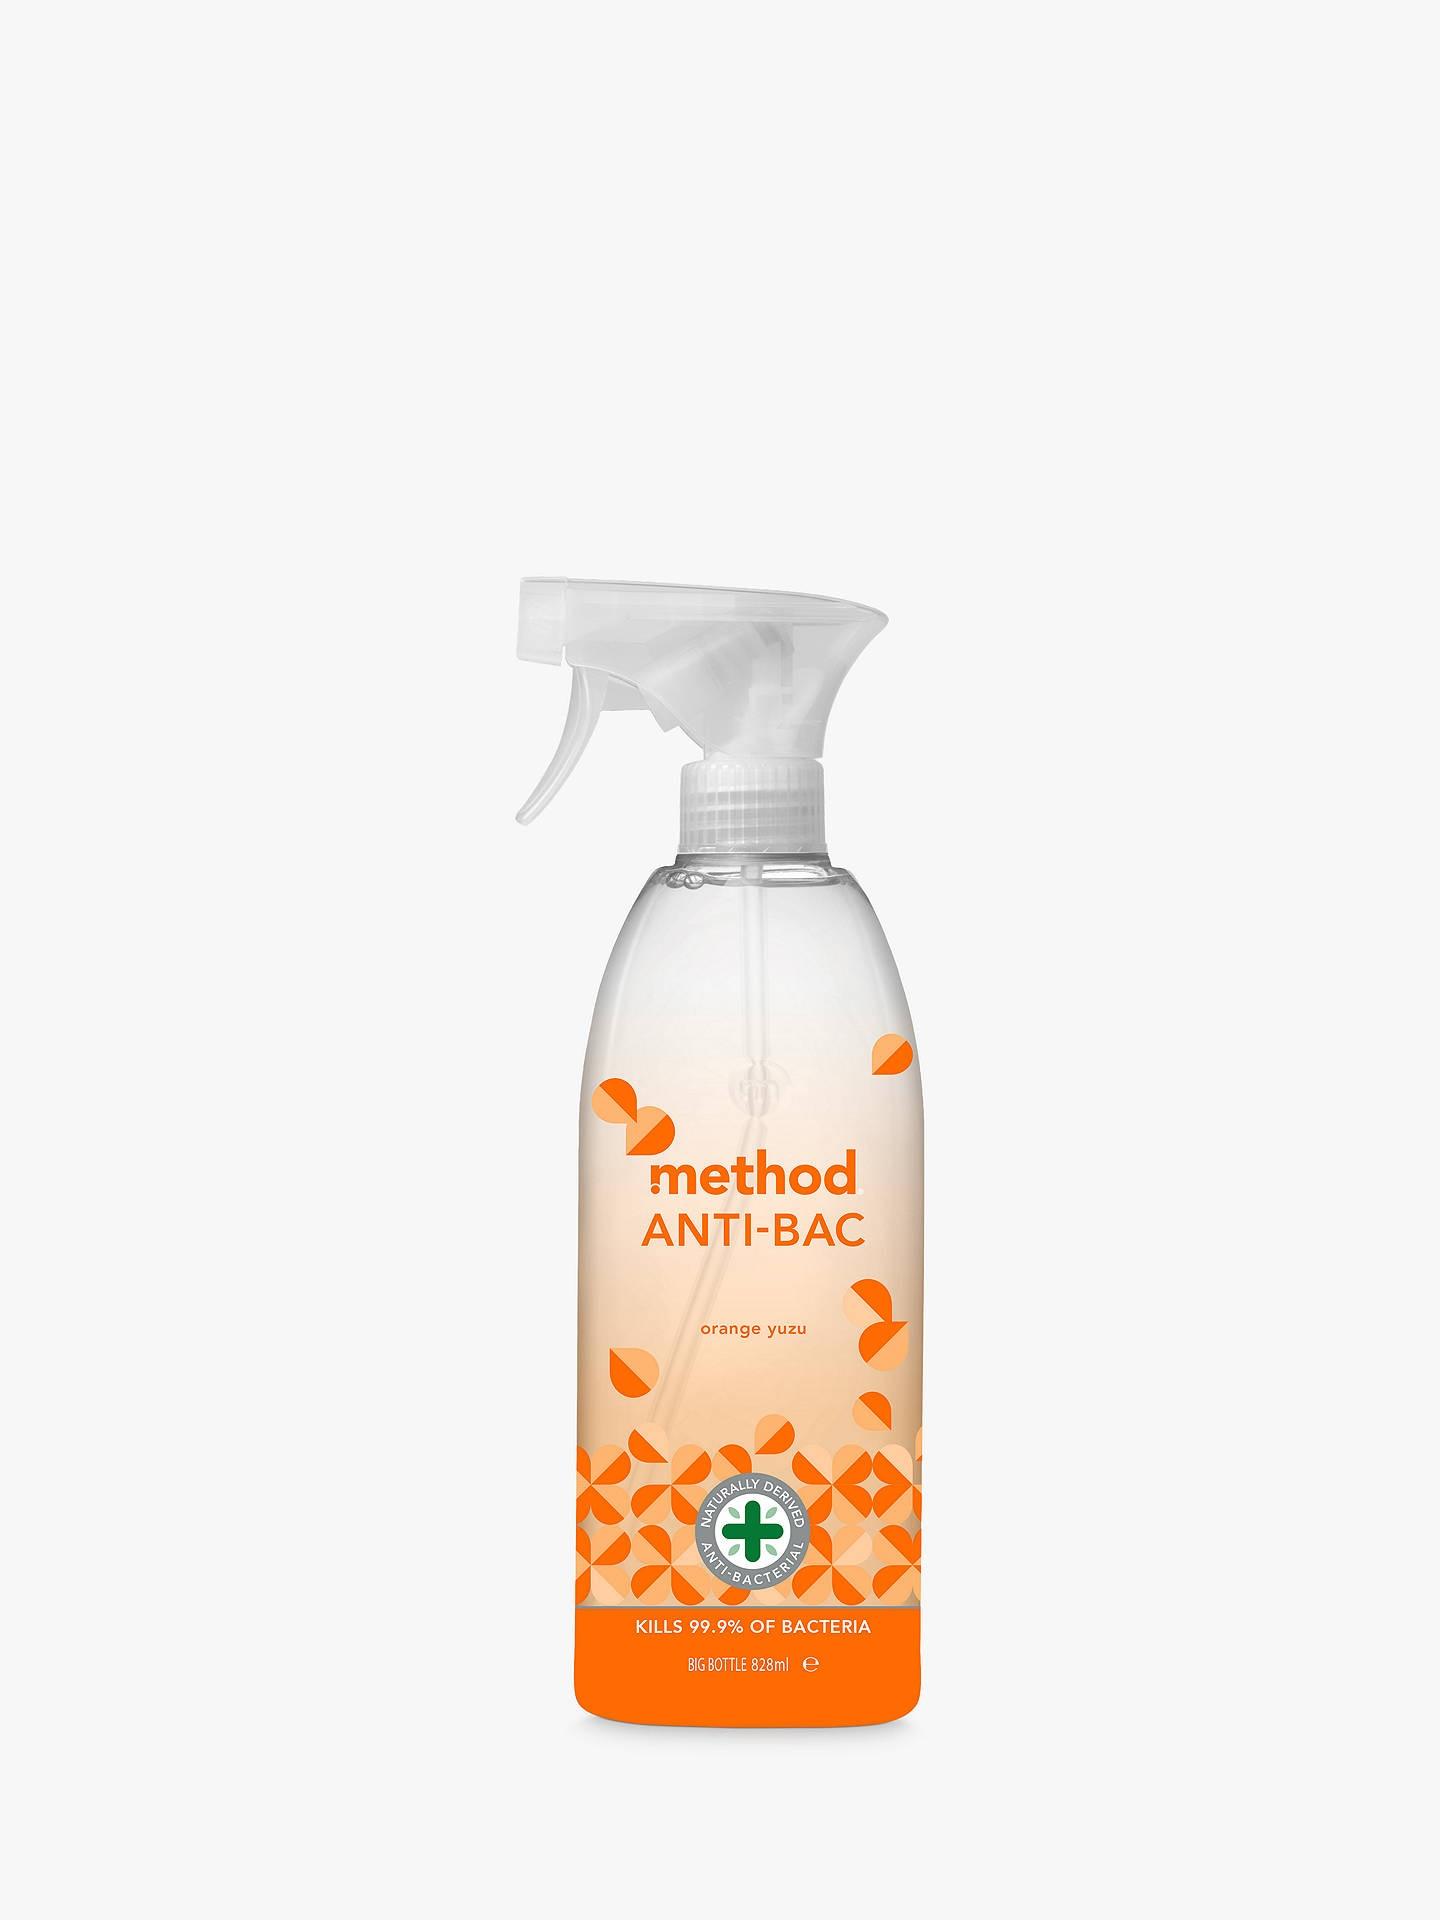 Method Antibac Cleaner Orange Yuzu 828ml